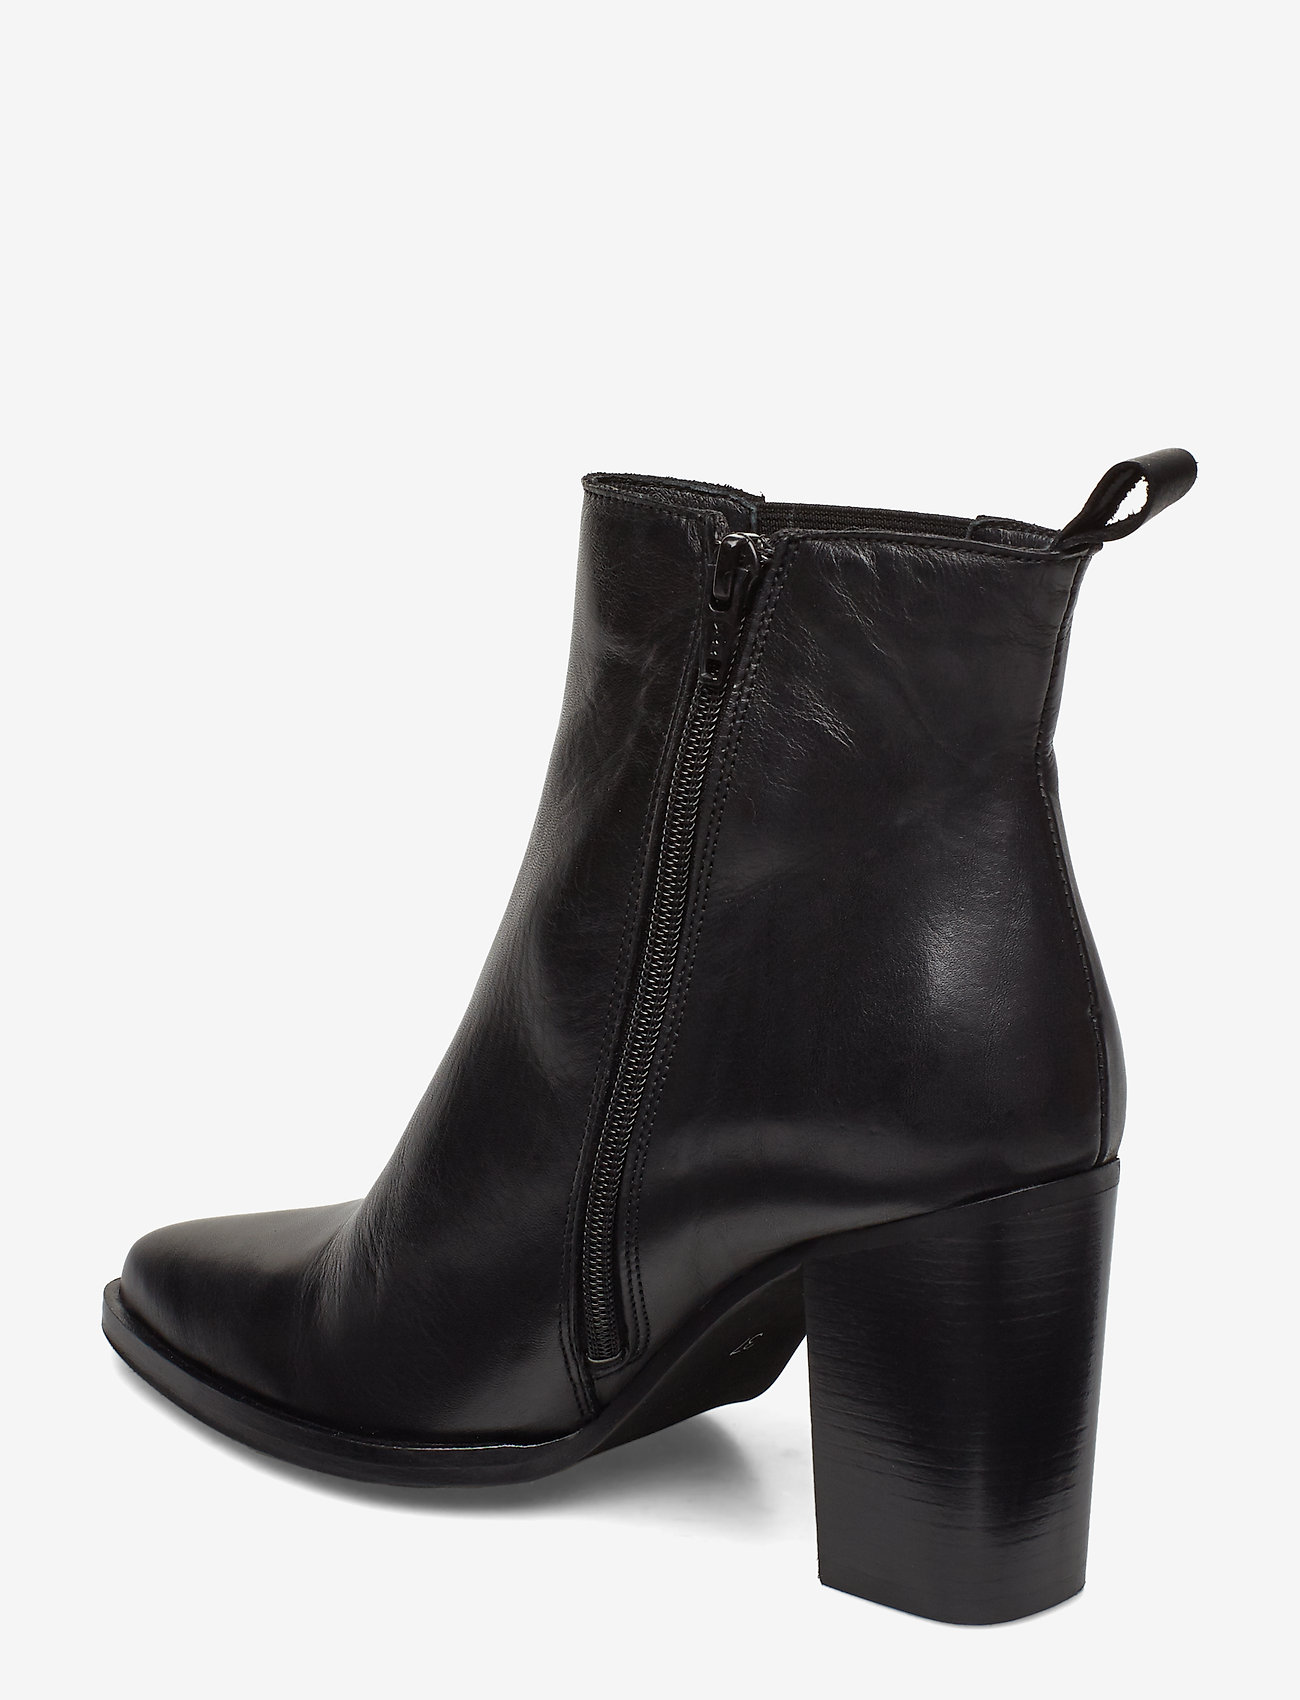 Biajudia Leather Boot (Black) - Bianco